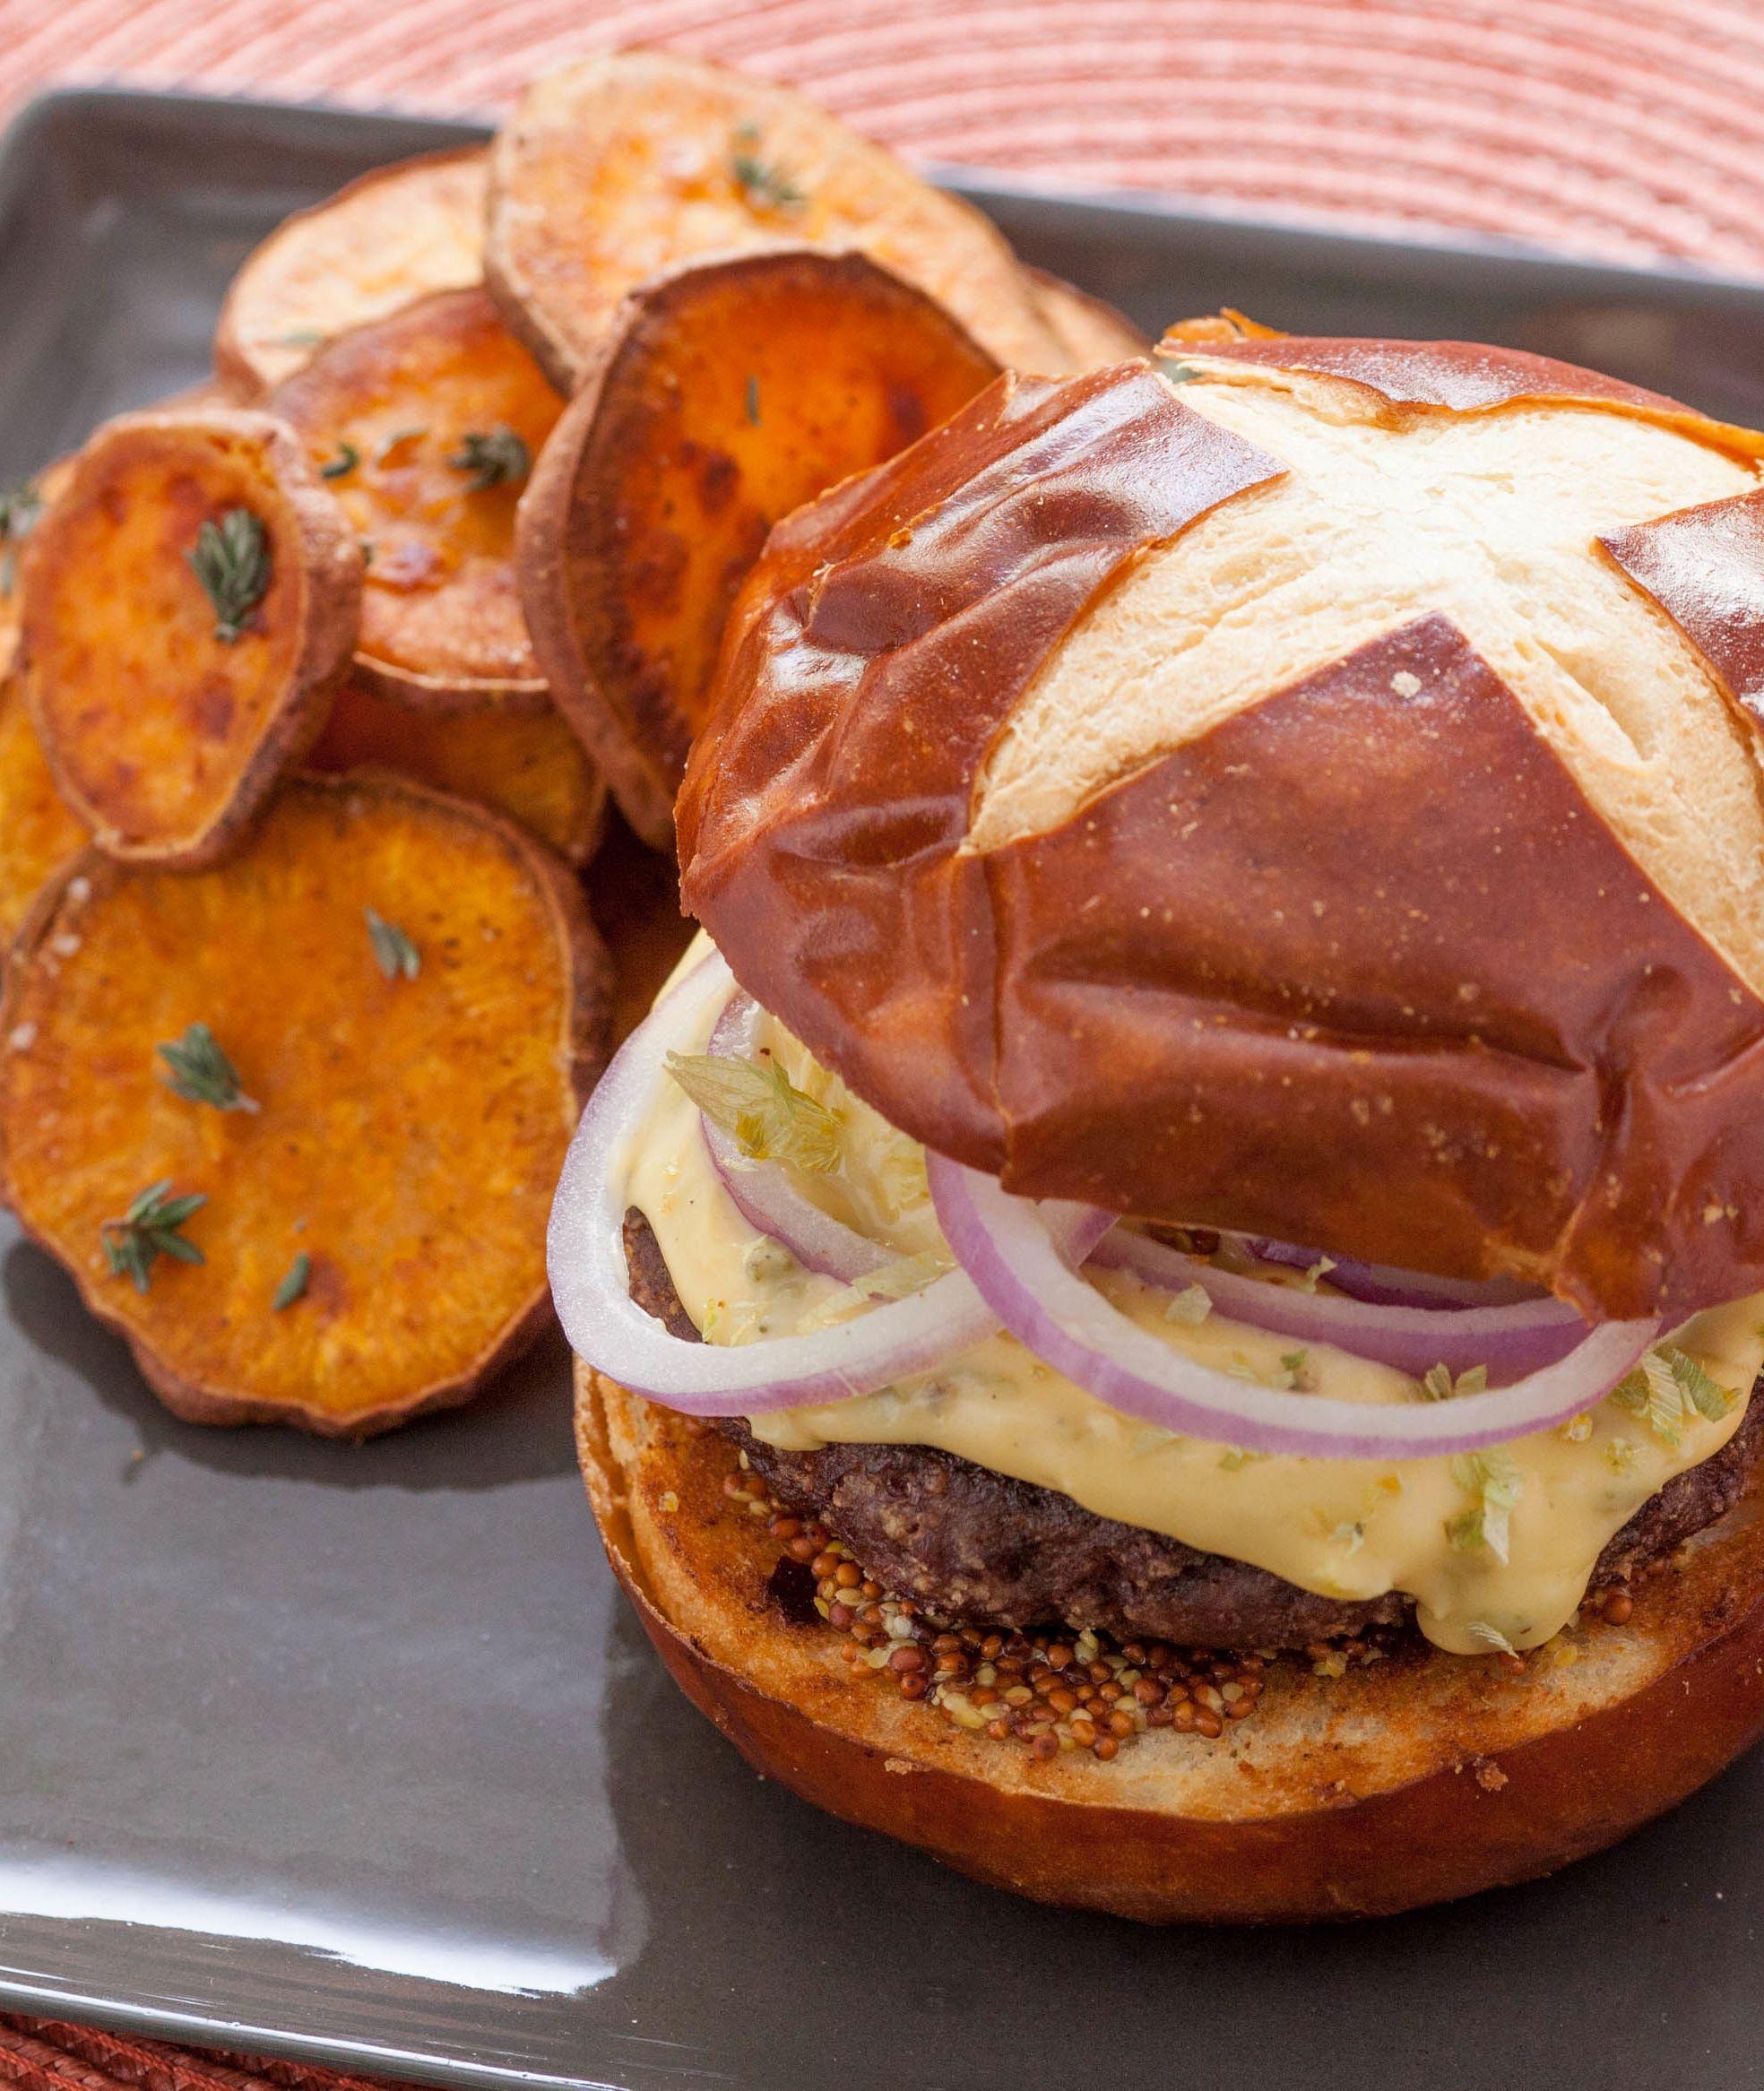 Blue apron turkey burger - Pretzel Burgers With Hoppy Cheddar Sauce Roasted Sweet Potato Rounds